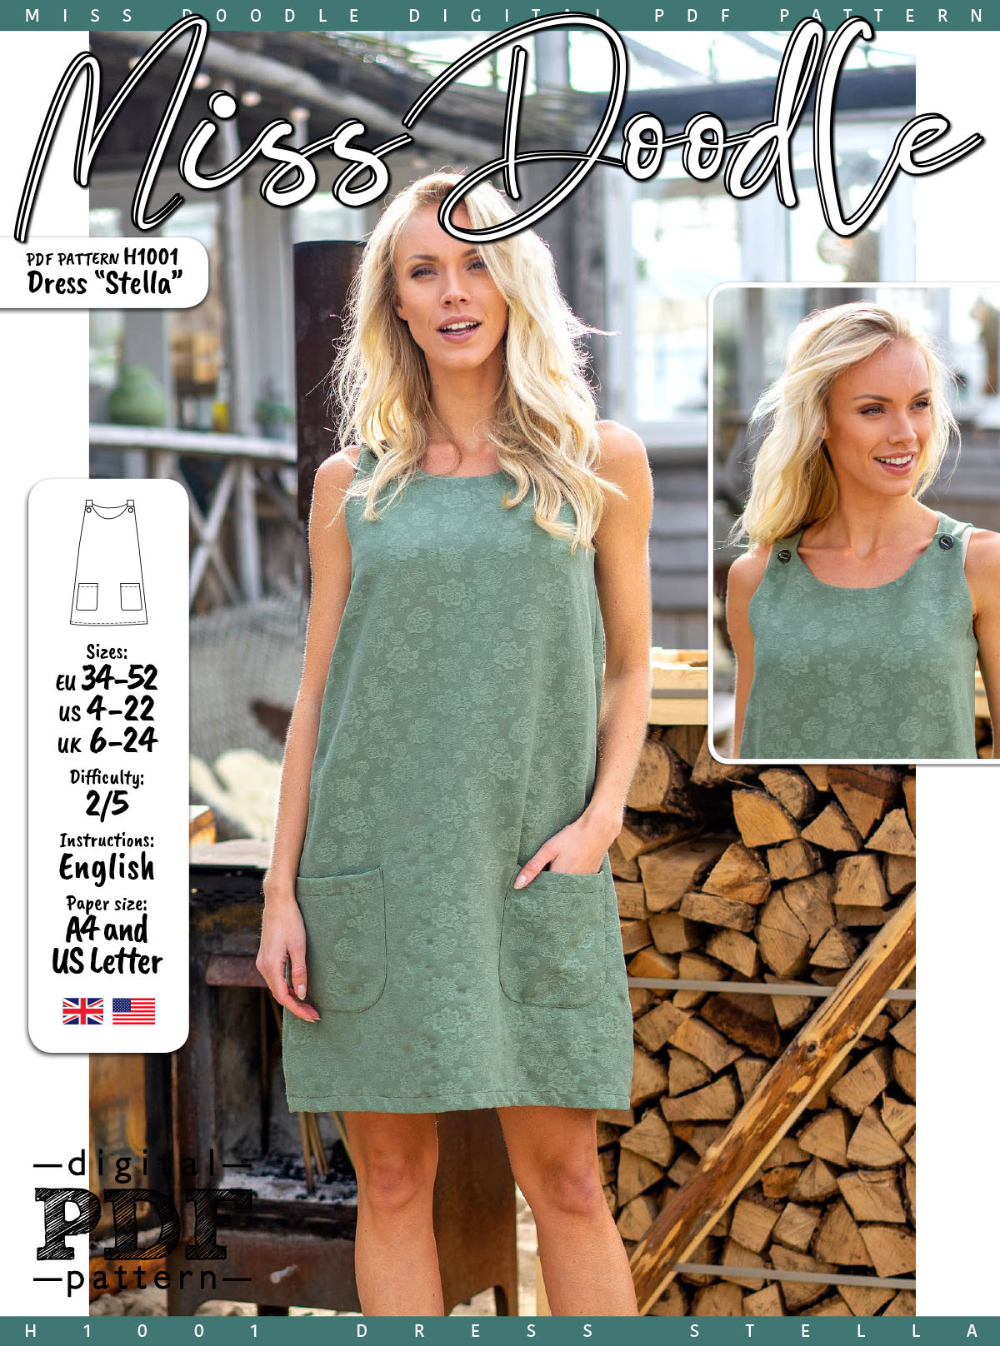 H1001 Dress Stella In 2020 Dresses Free Pdf Pattern Summer Dresses